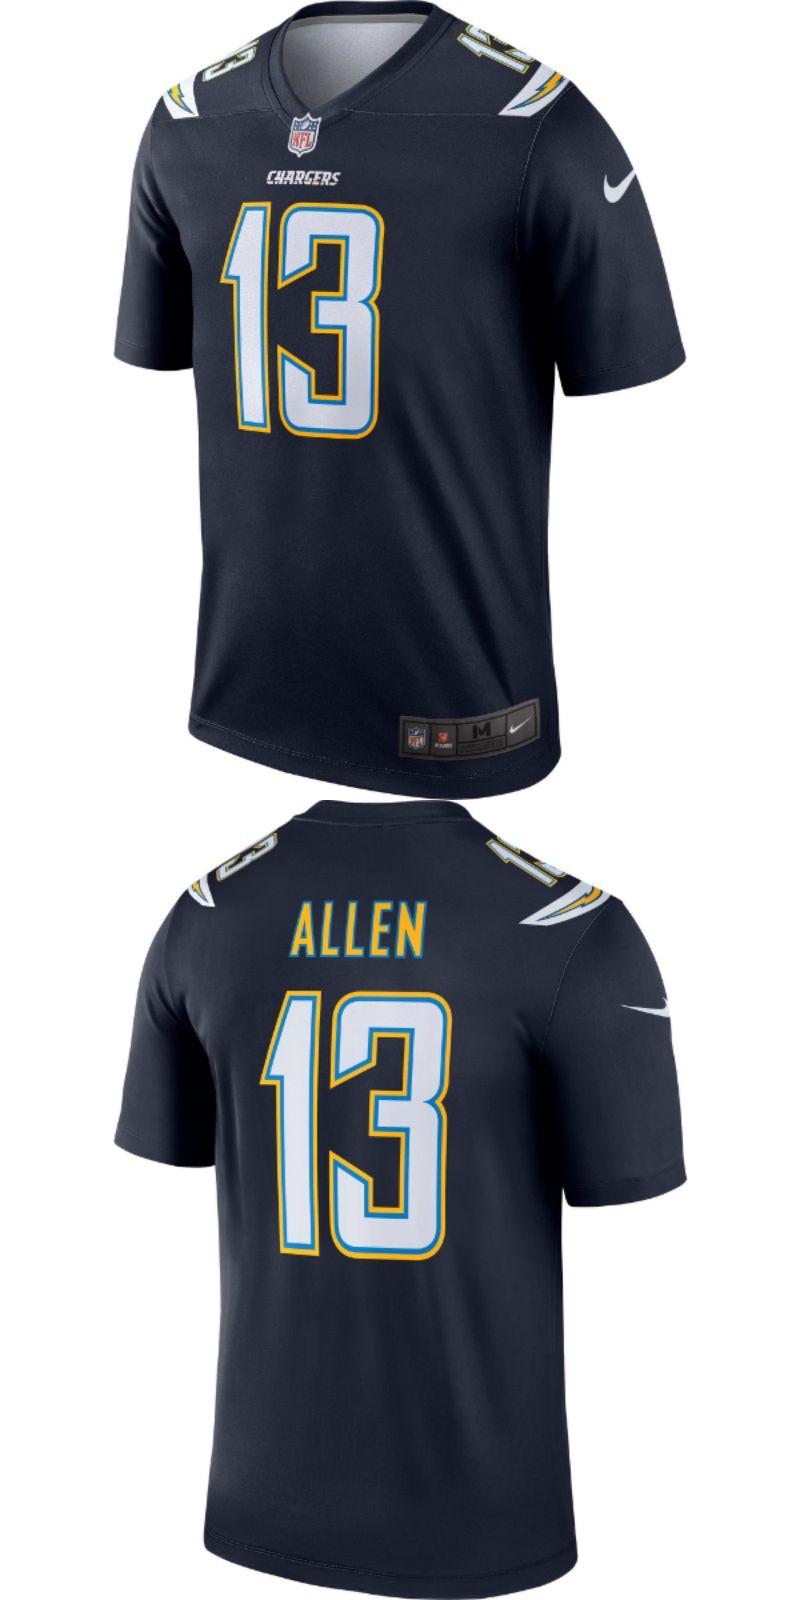 brand new fbfa0 f35f3 mens Los Angeles Chargers custom football Game jersey | NFL ...